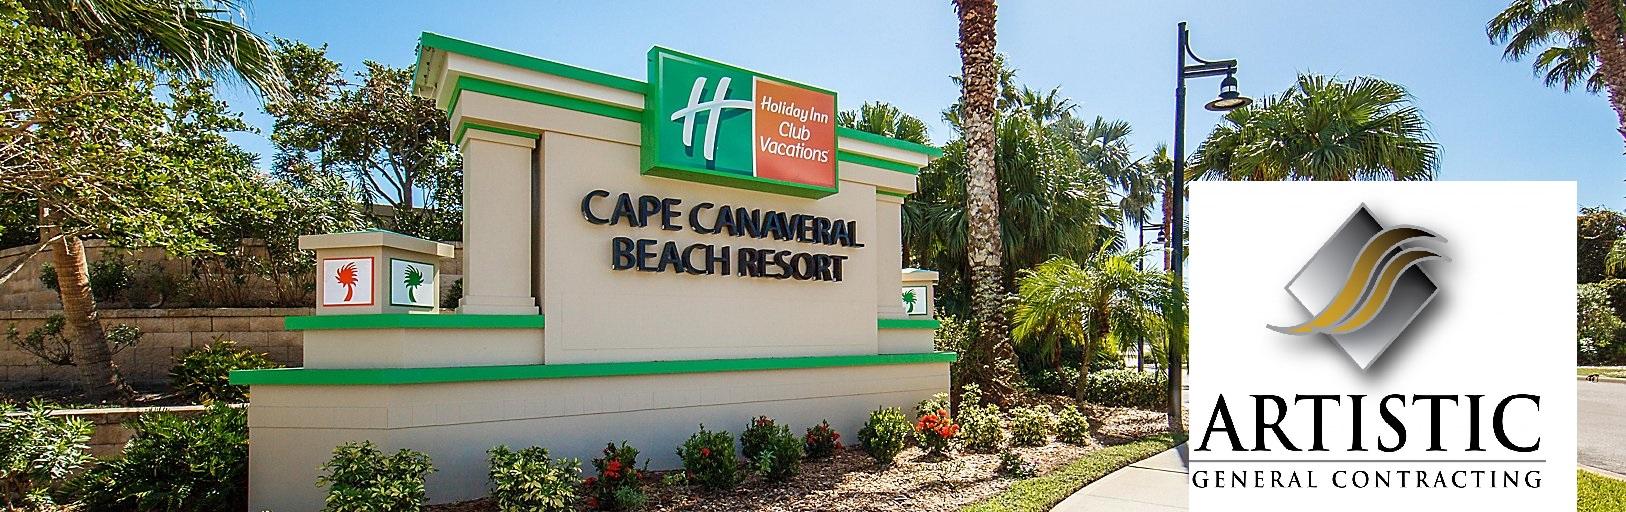 holiday-inn-club-vacations-cape-canavera